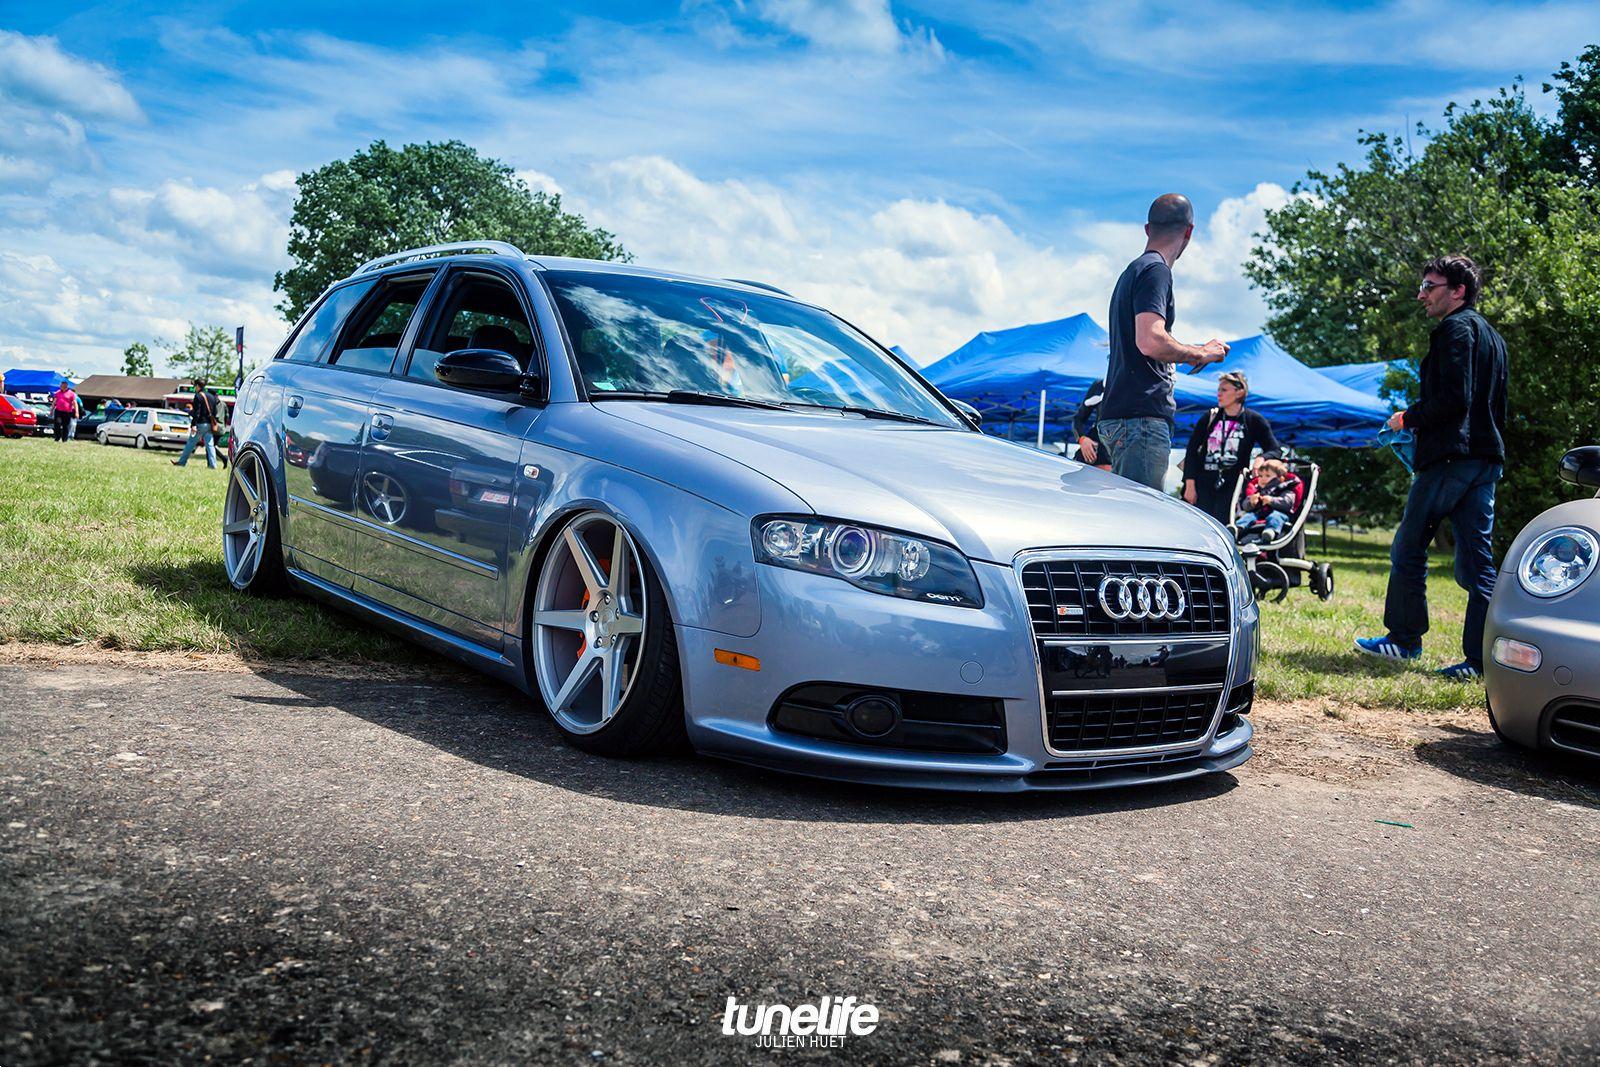 Audi A4 B7 Avant Tuning 6 Tuning アウディ 車